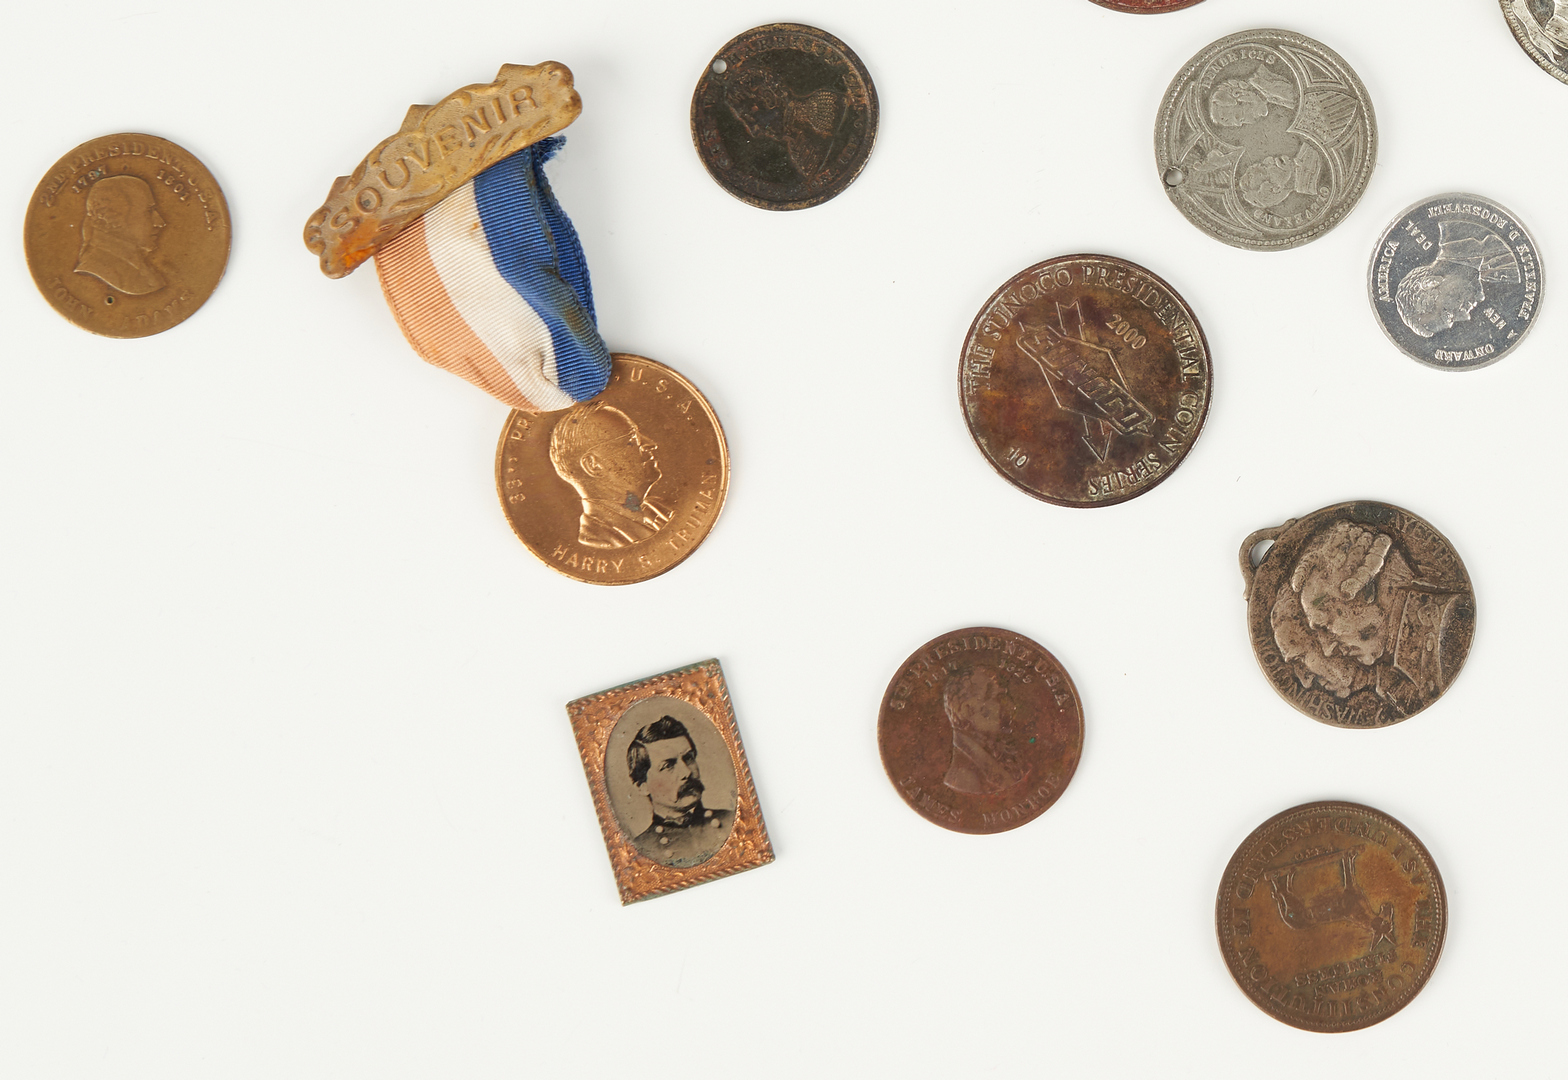 Lot 1004: 31 Political Ephemera Items, incl. Roosevelt Pocket Knife